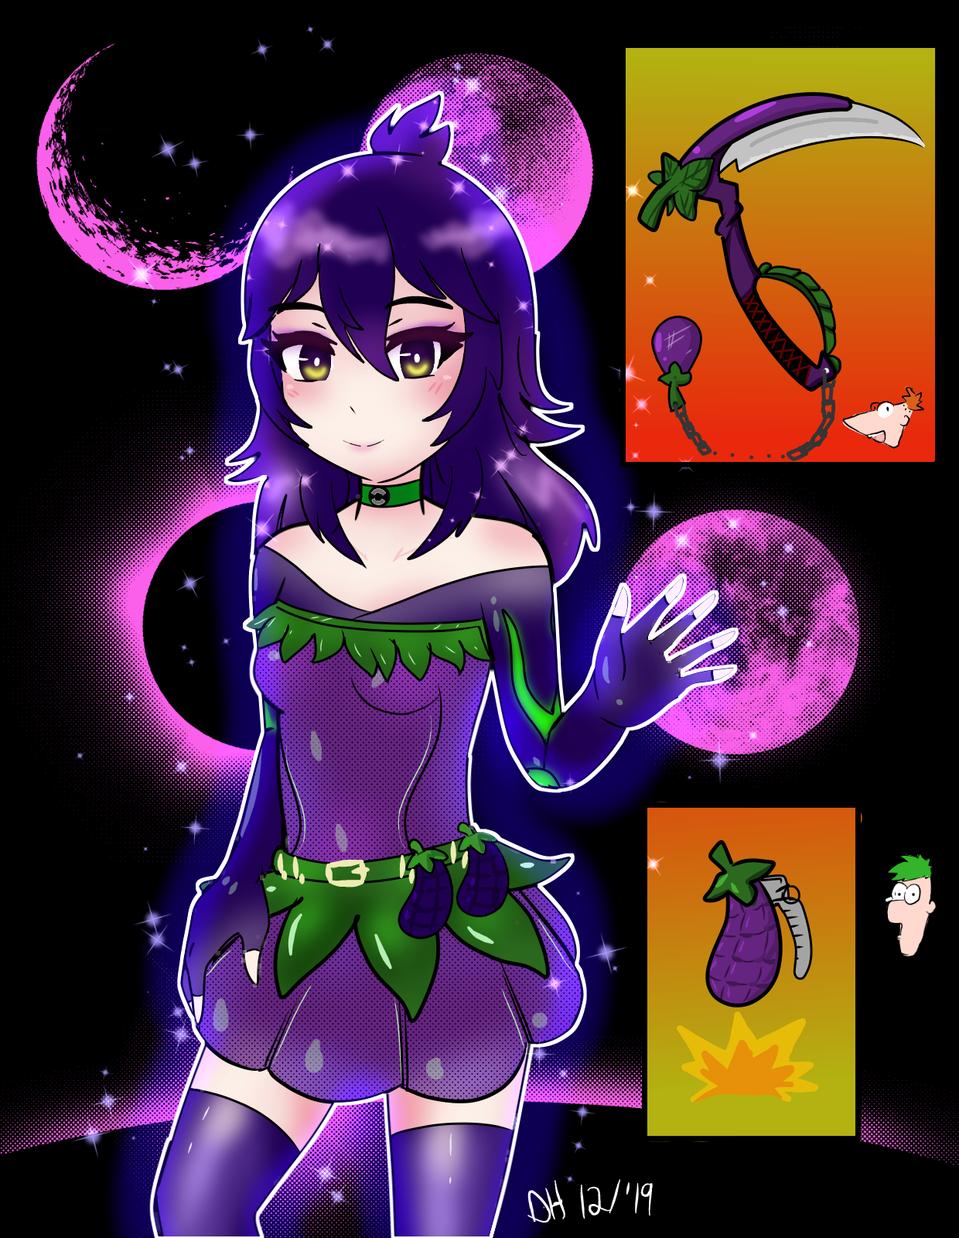 Eggplant quest outfit!